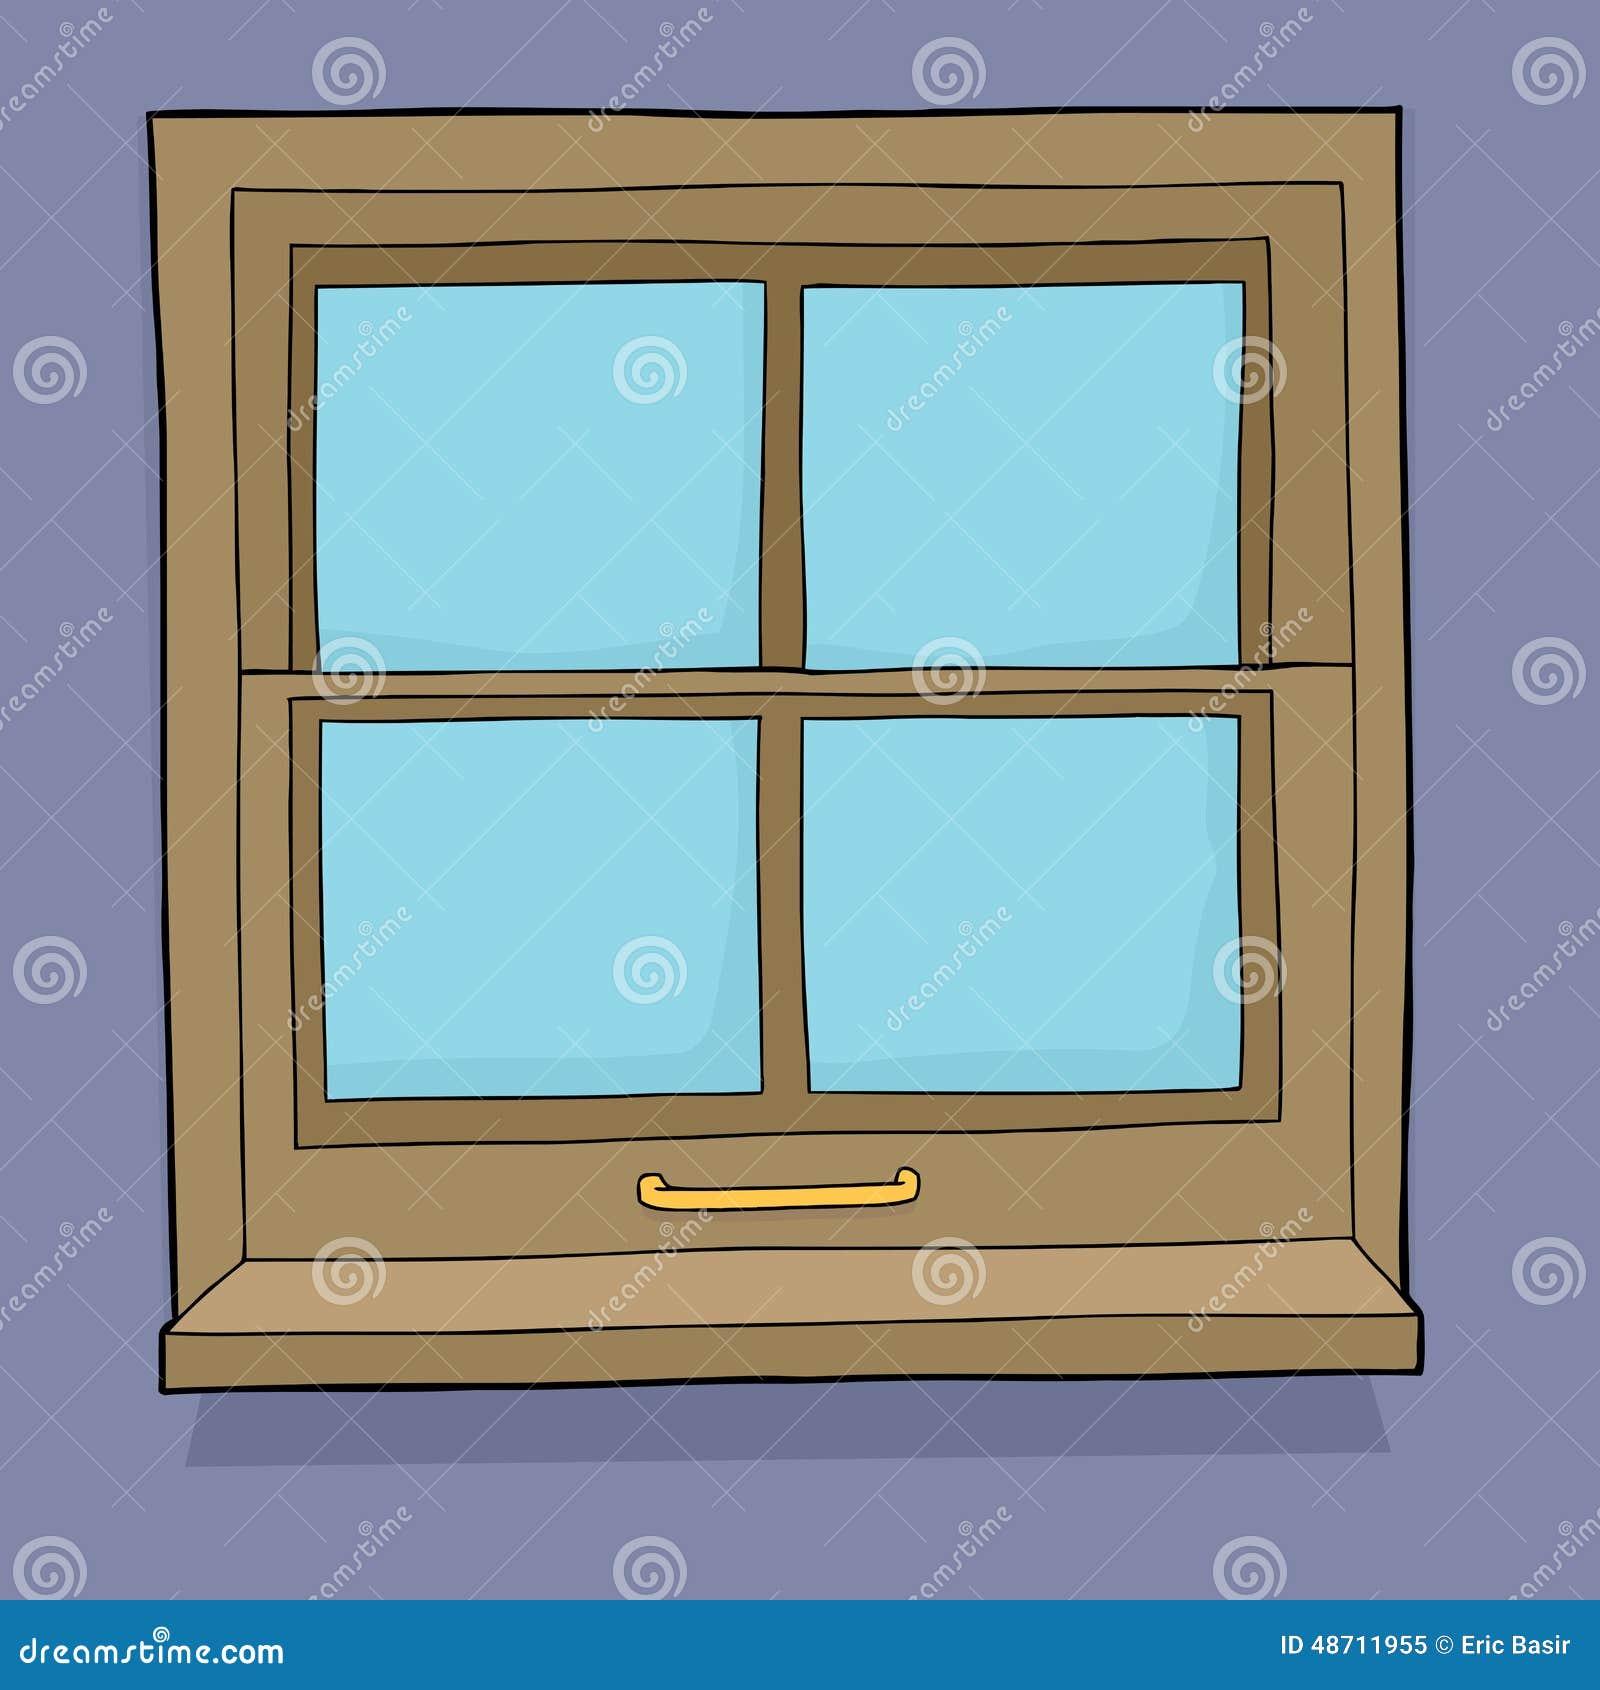 Cartoon window stock illustration image 48711955 for Window design 4 by 4